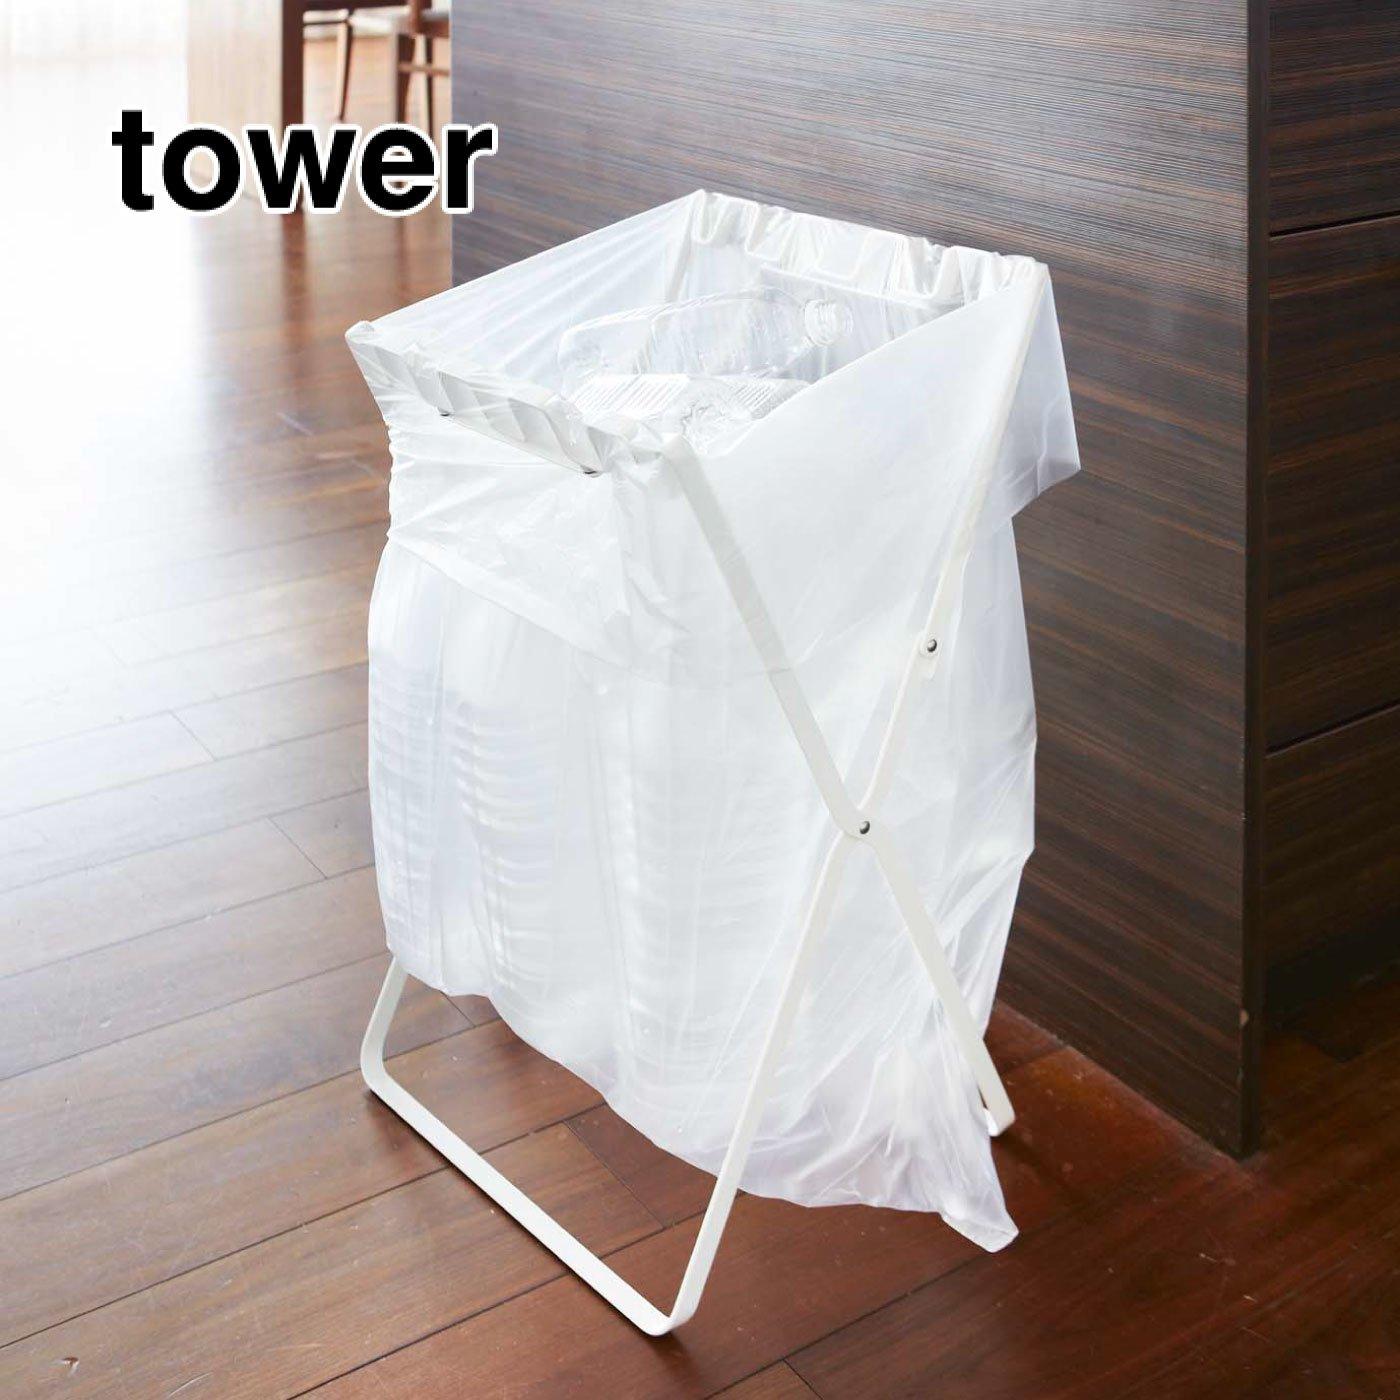 tower ゴミ袋 レジ袋スタンド